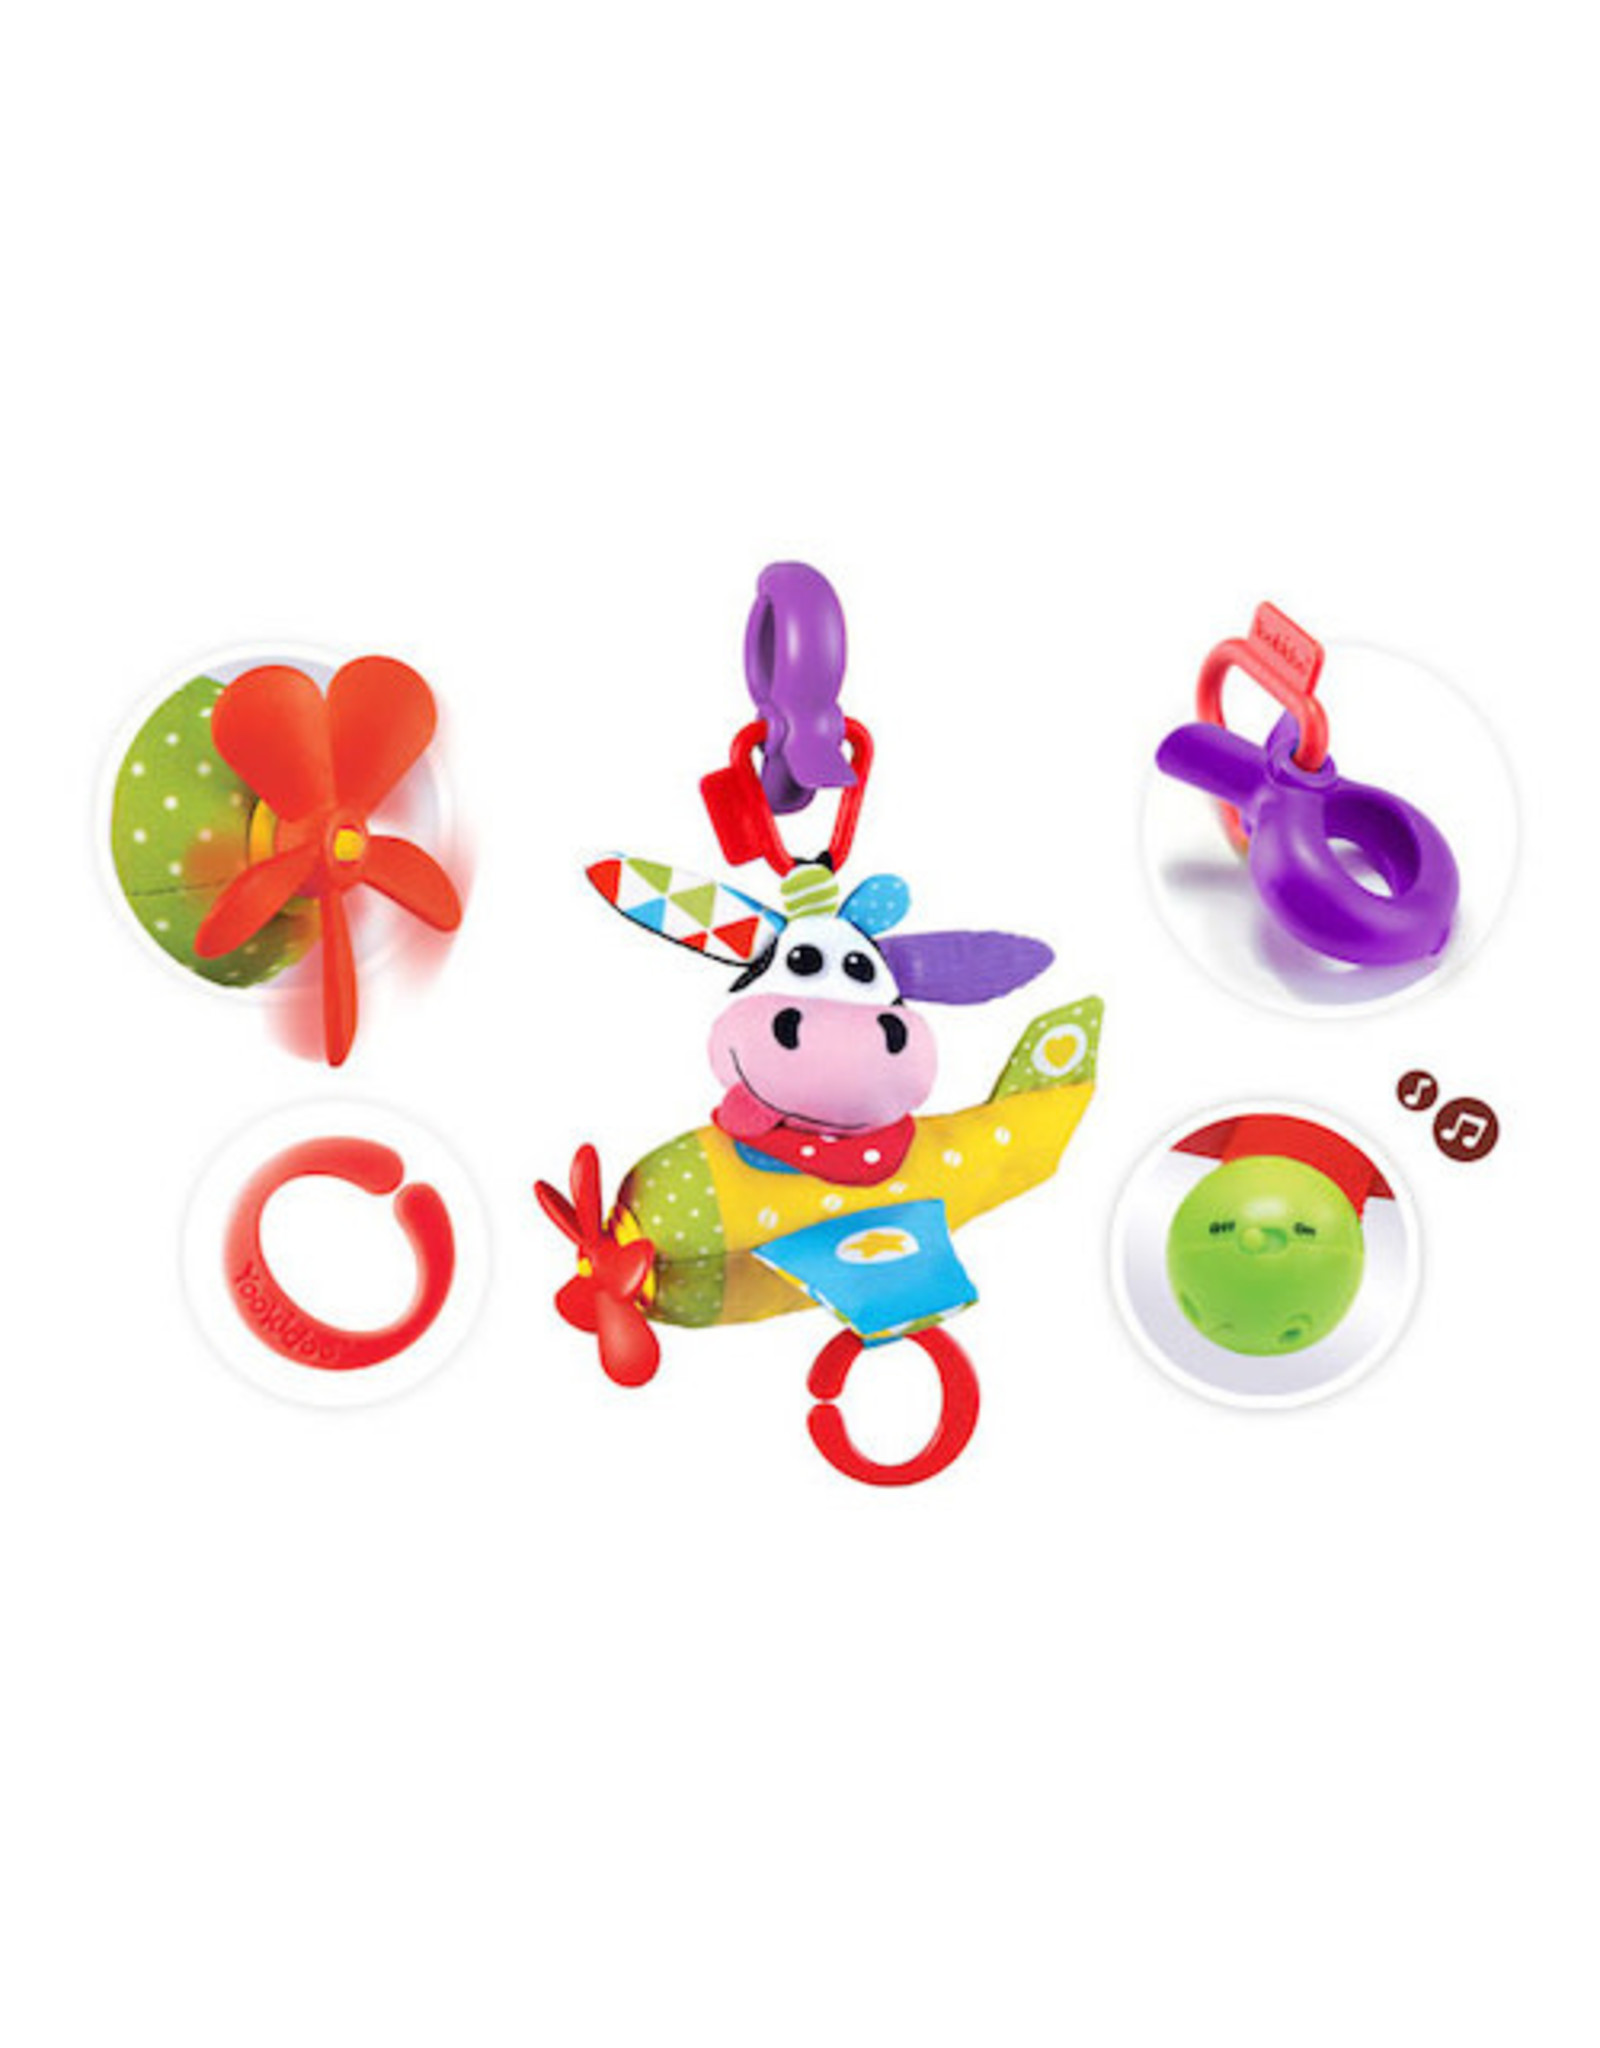 Yookidoo Tap N Play Musical Plane Cow